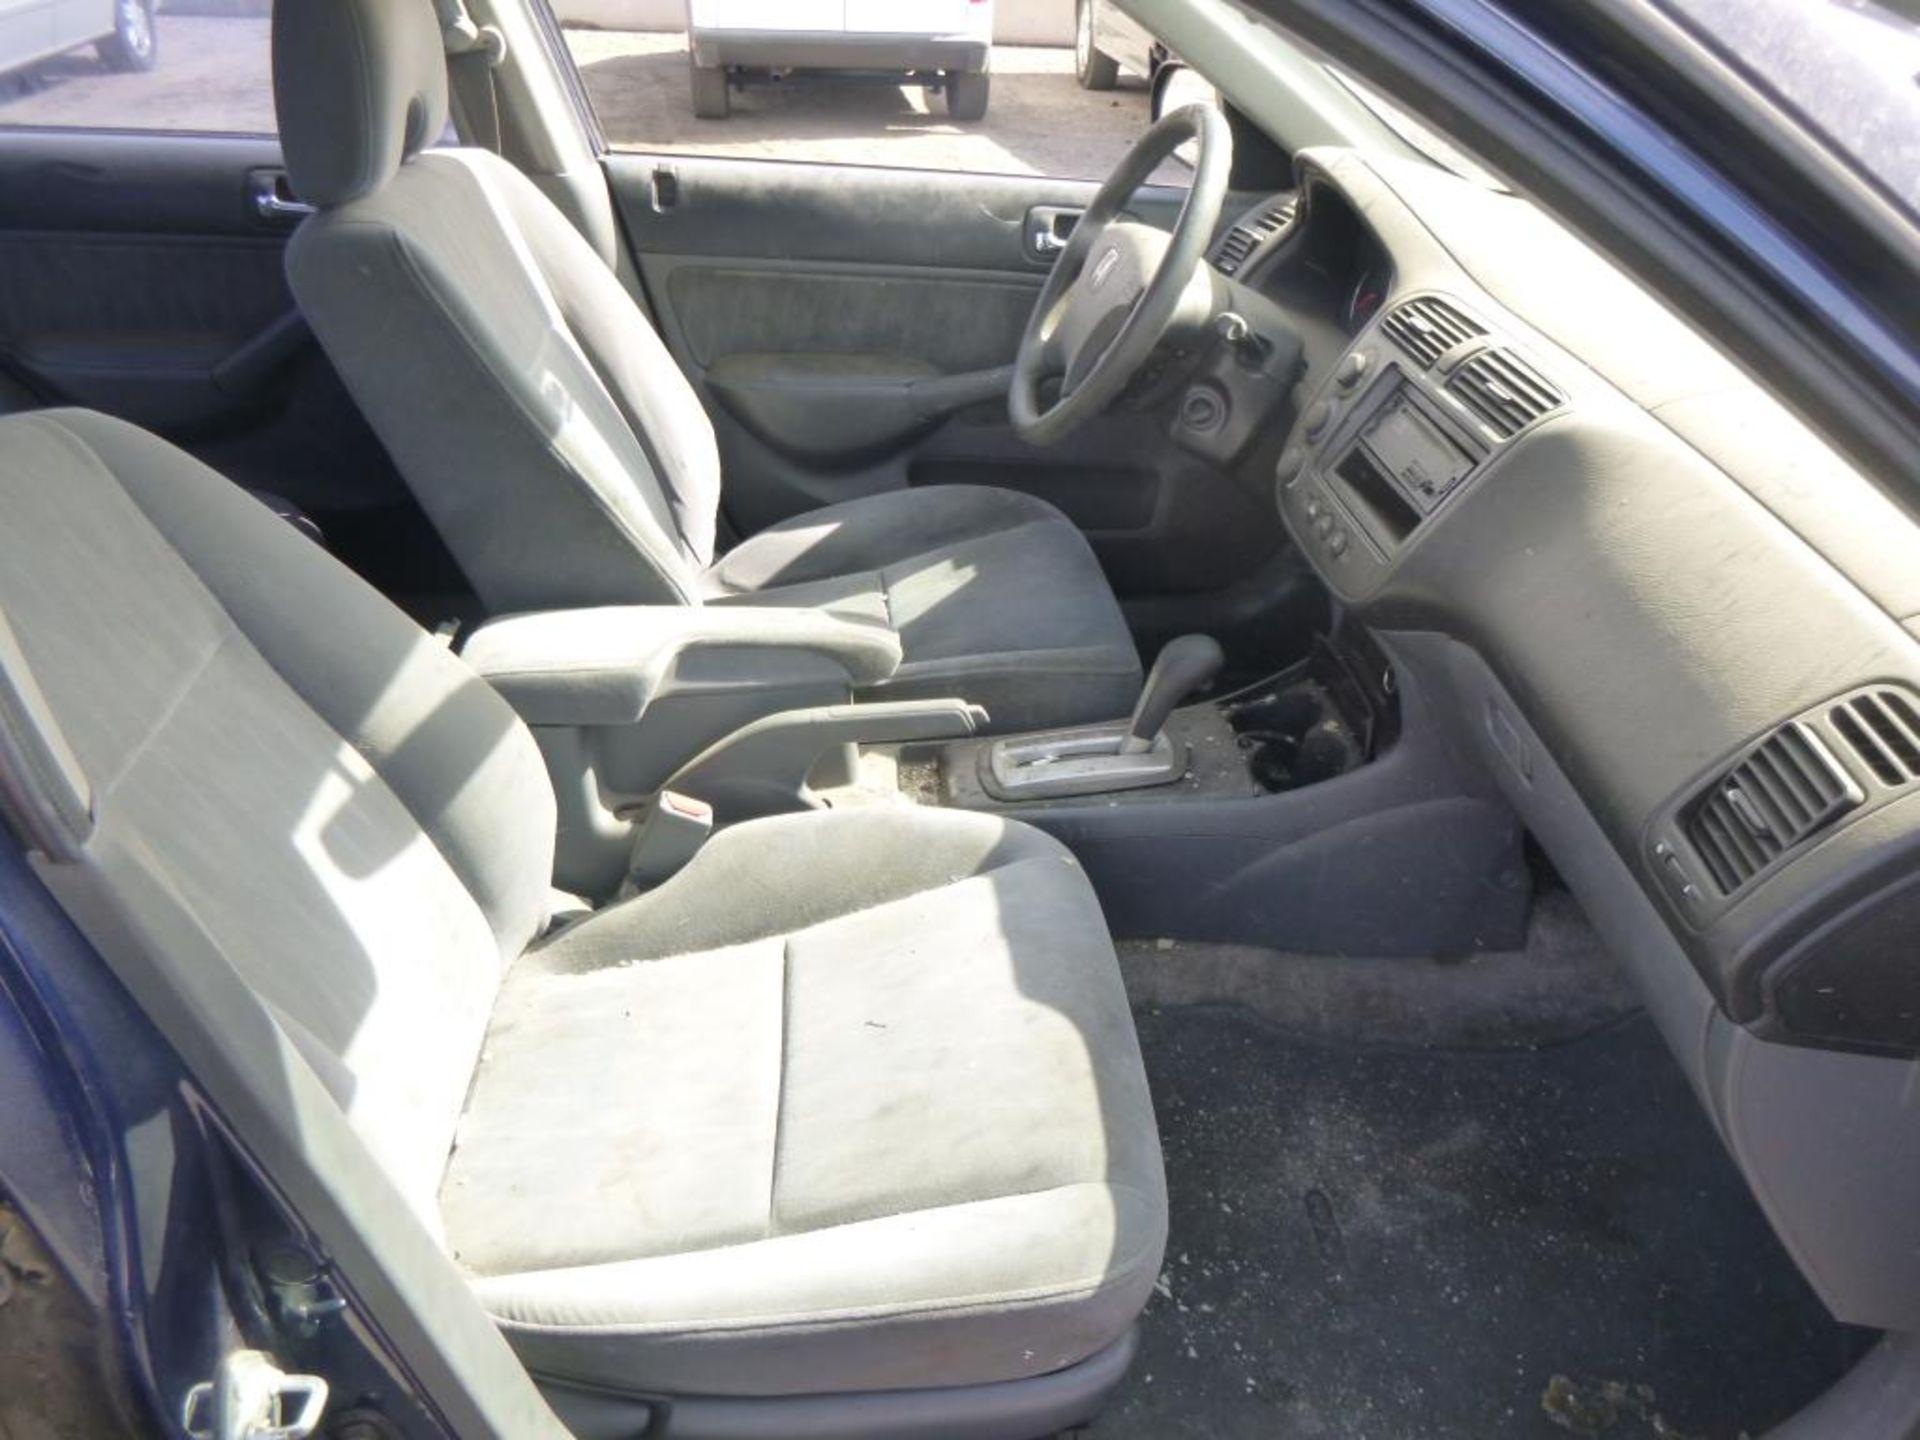 2004 Honda Civic - Image 9 of 14